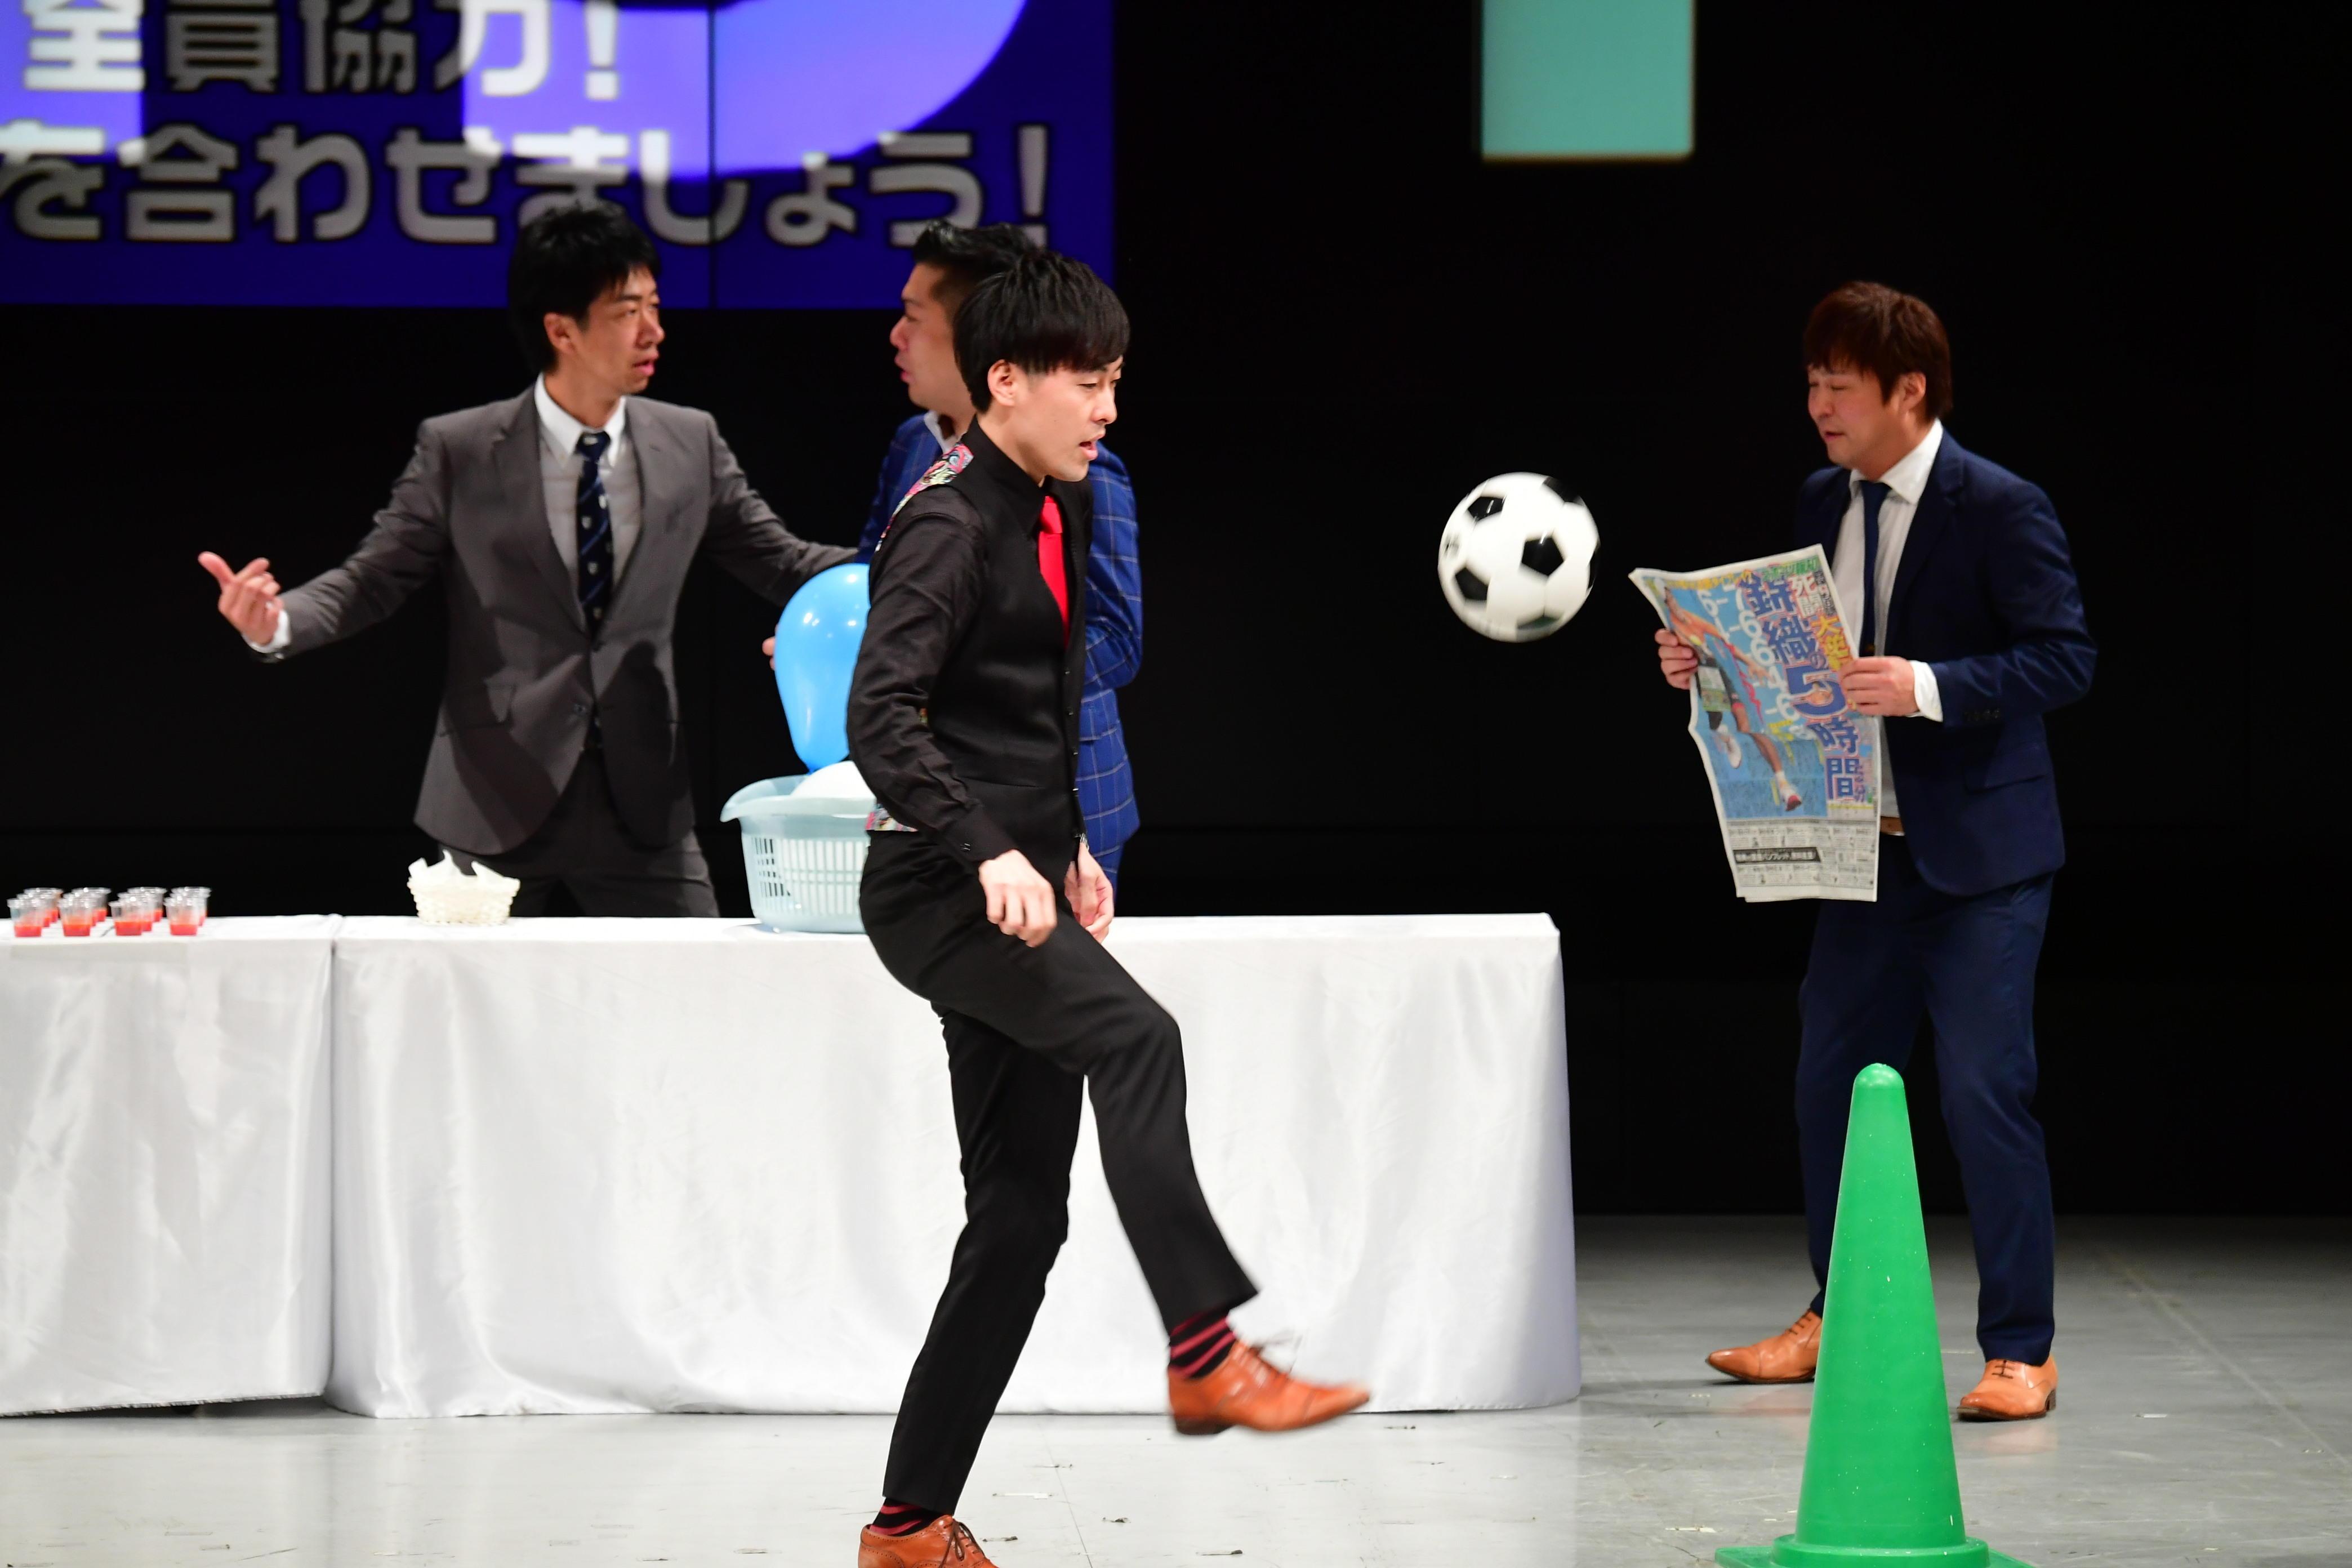 http://news.yoshimoto.co.jp/20190128190234-55cd517026affdf5f3d96abc0913f25de9d9182b.jpg